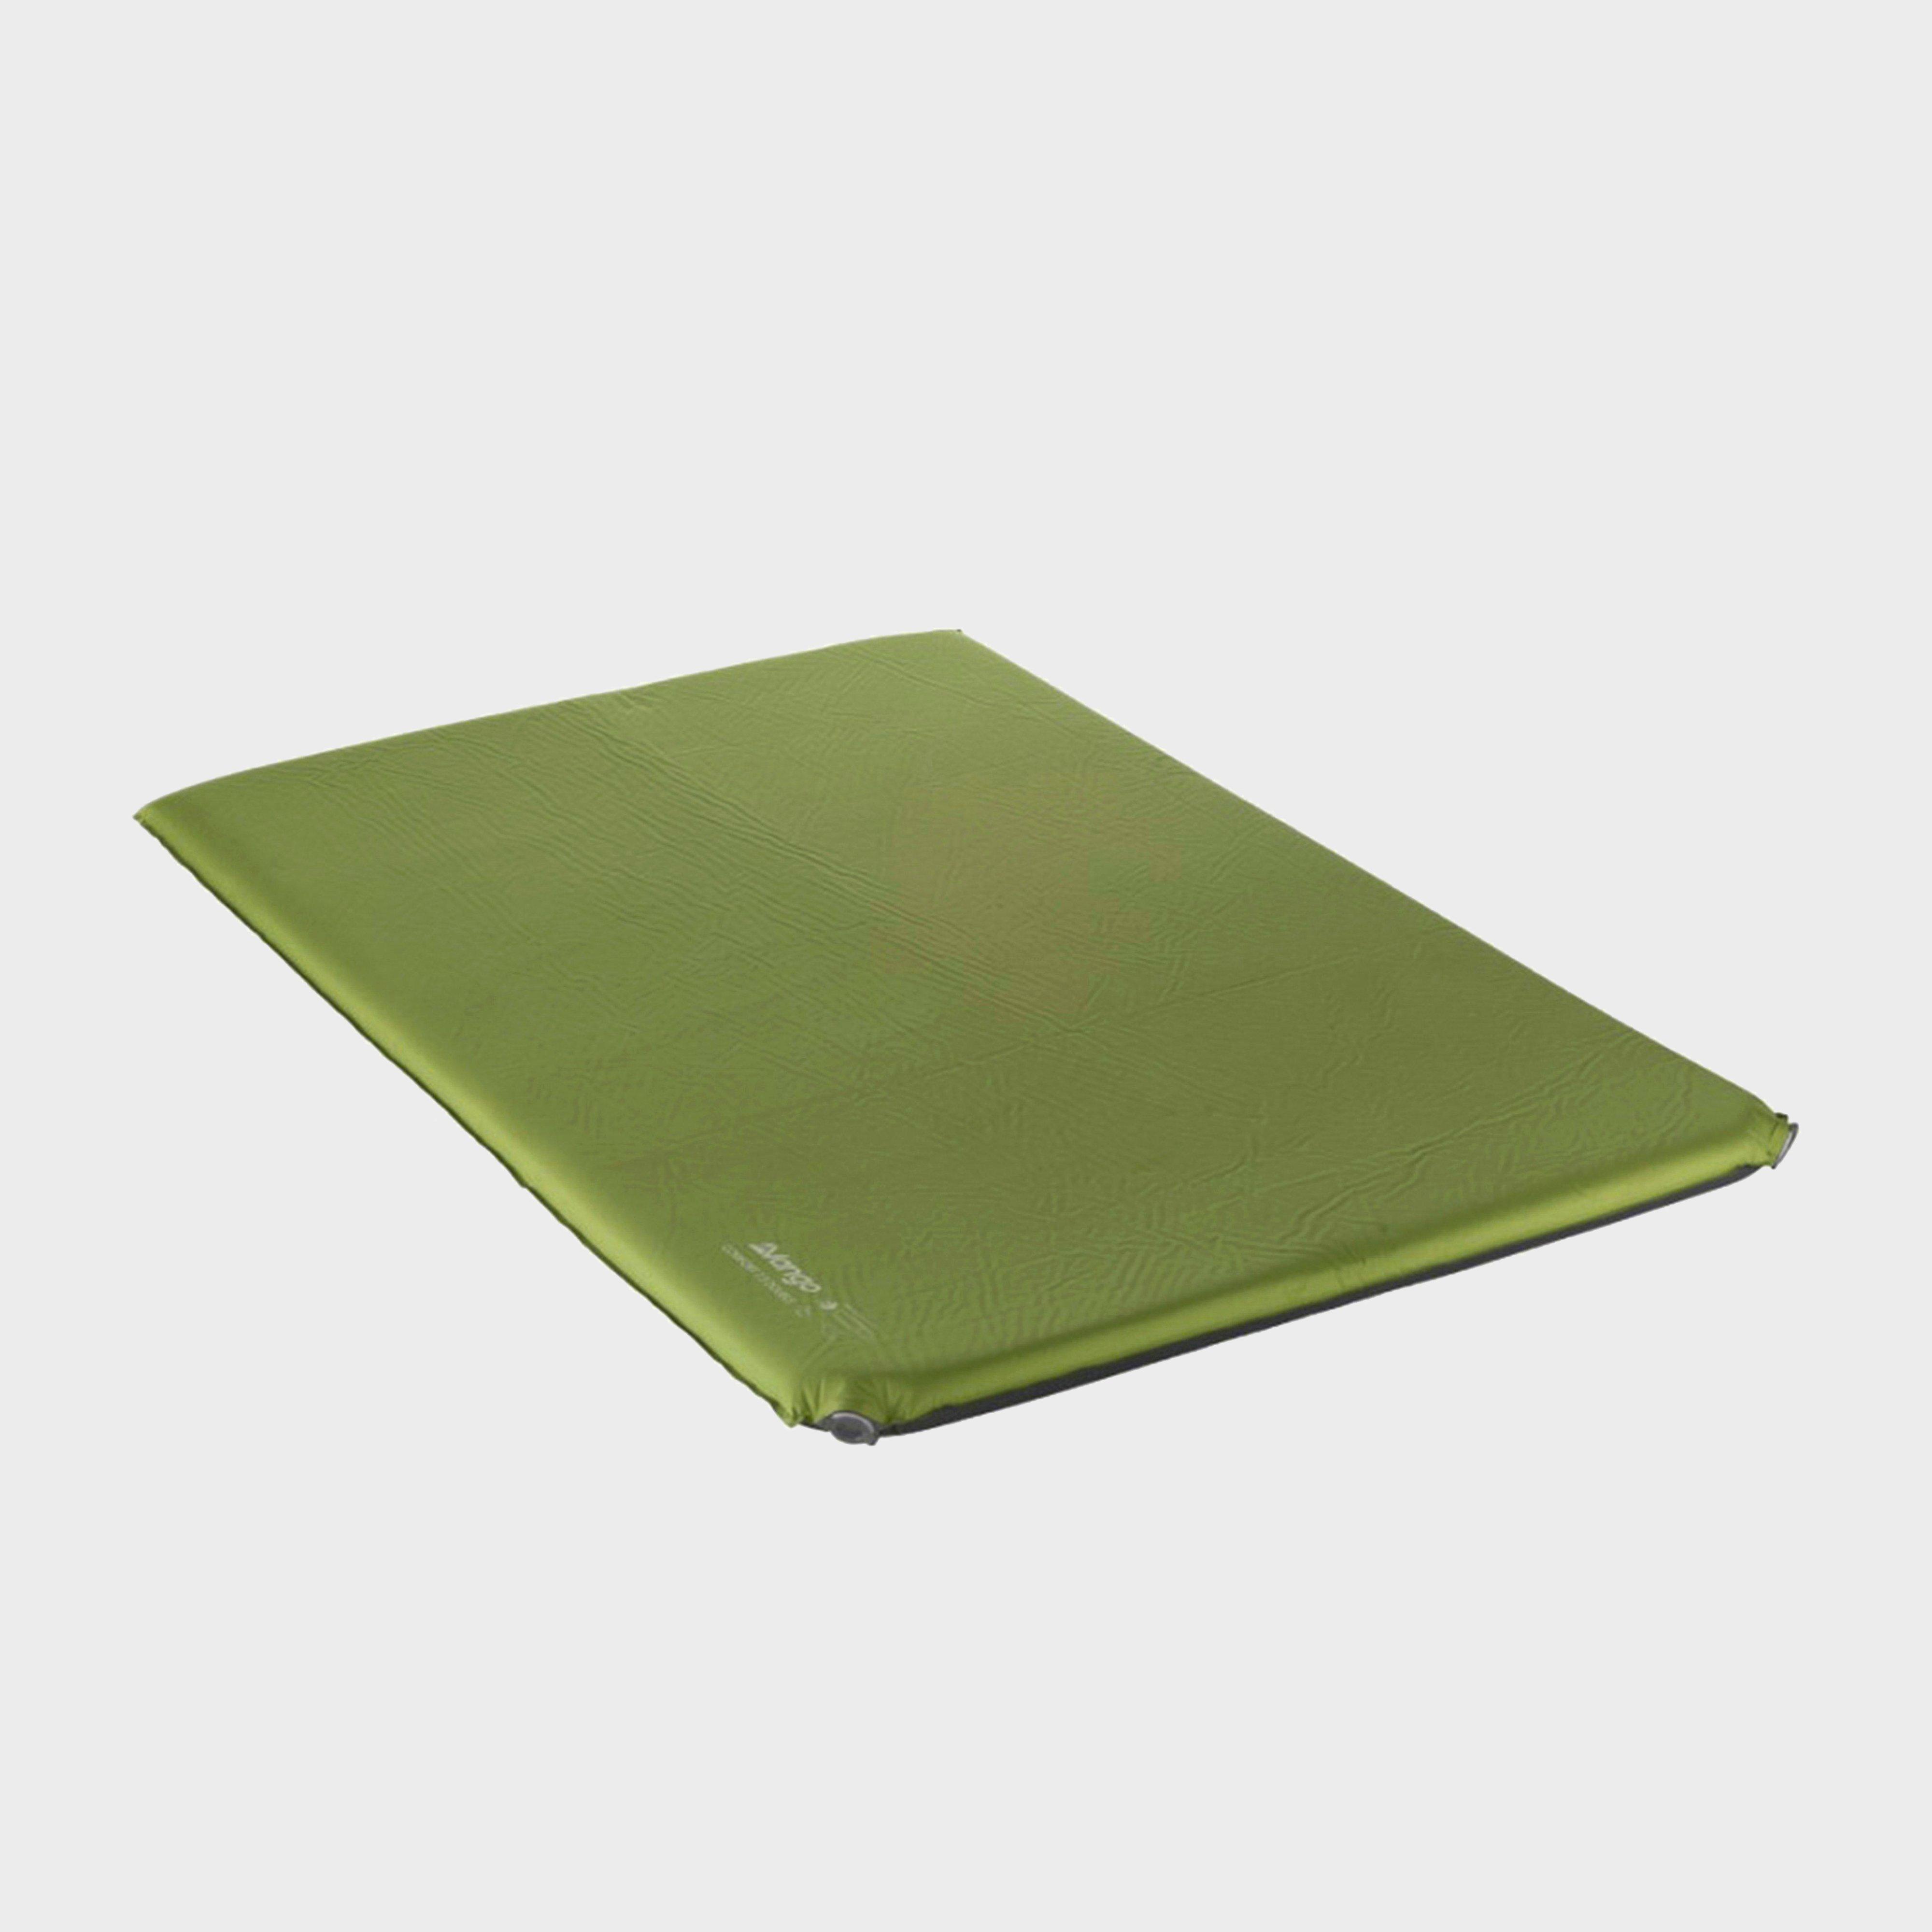 Vango Comfort 7.5 Double Sleeping Mat - Green/green  Green/green